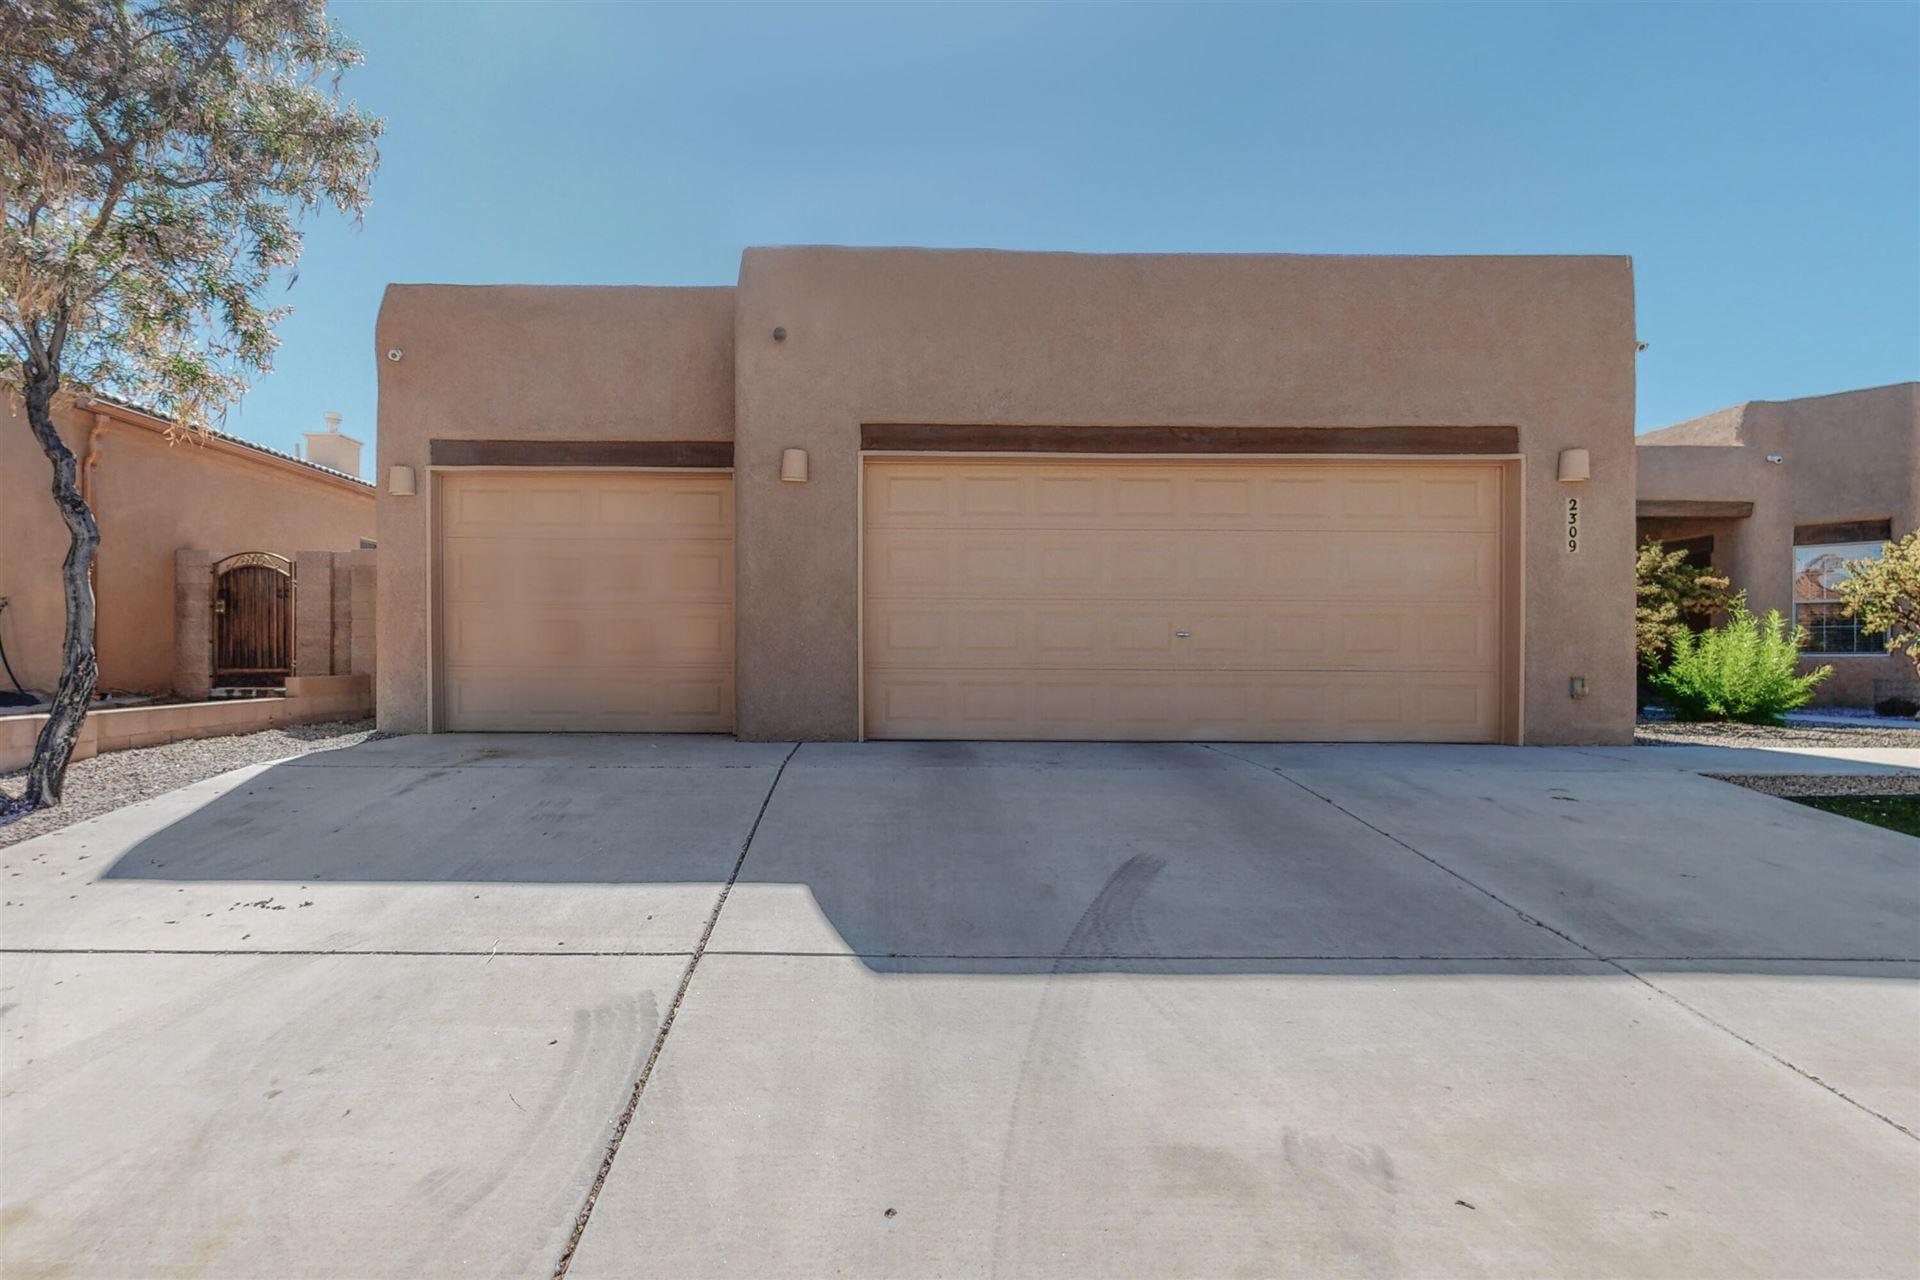 Photo of 2309 WILDSTREAM Street NW, Albuquerque, NM 87120 (MLS # 994252)